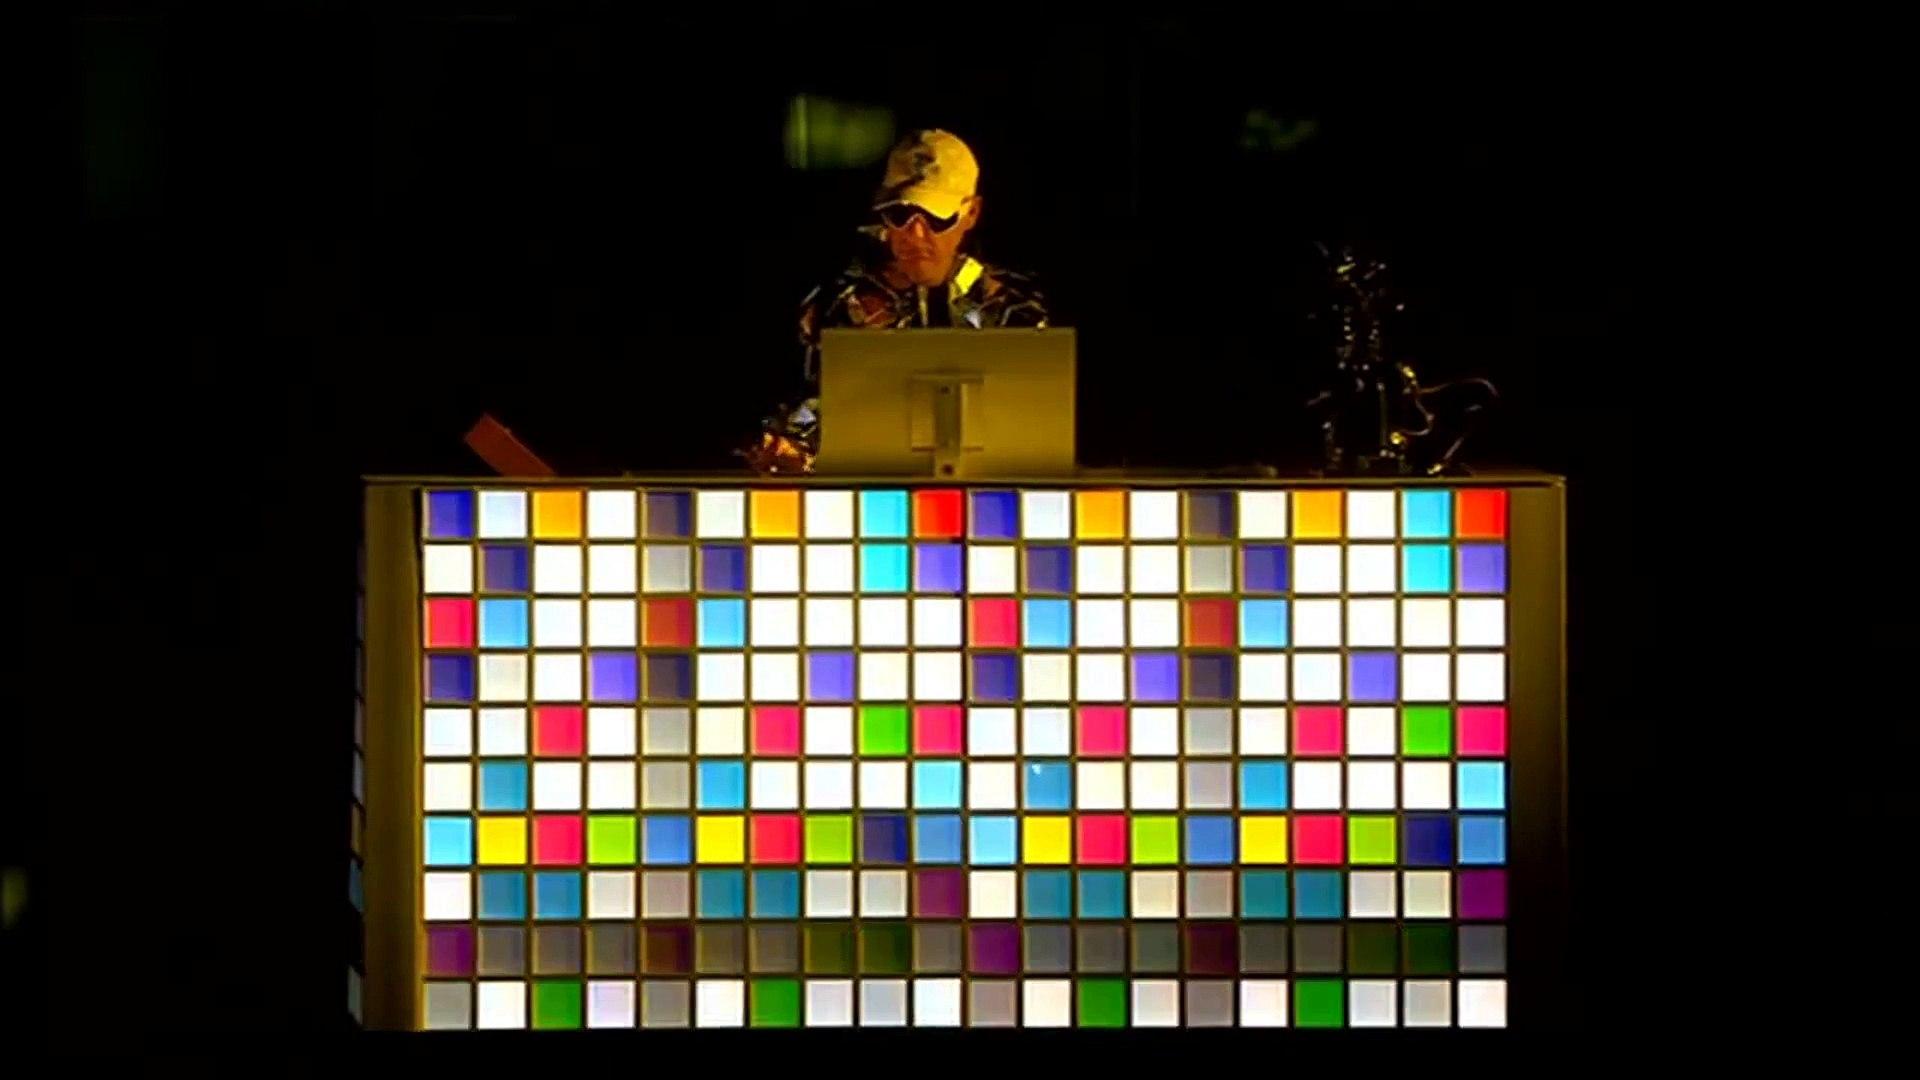 Pet Shop Boys and Elvis Presley - Always On My Mind (RM's 2013 mix) better Elvis